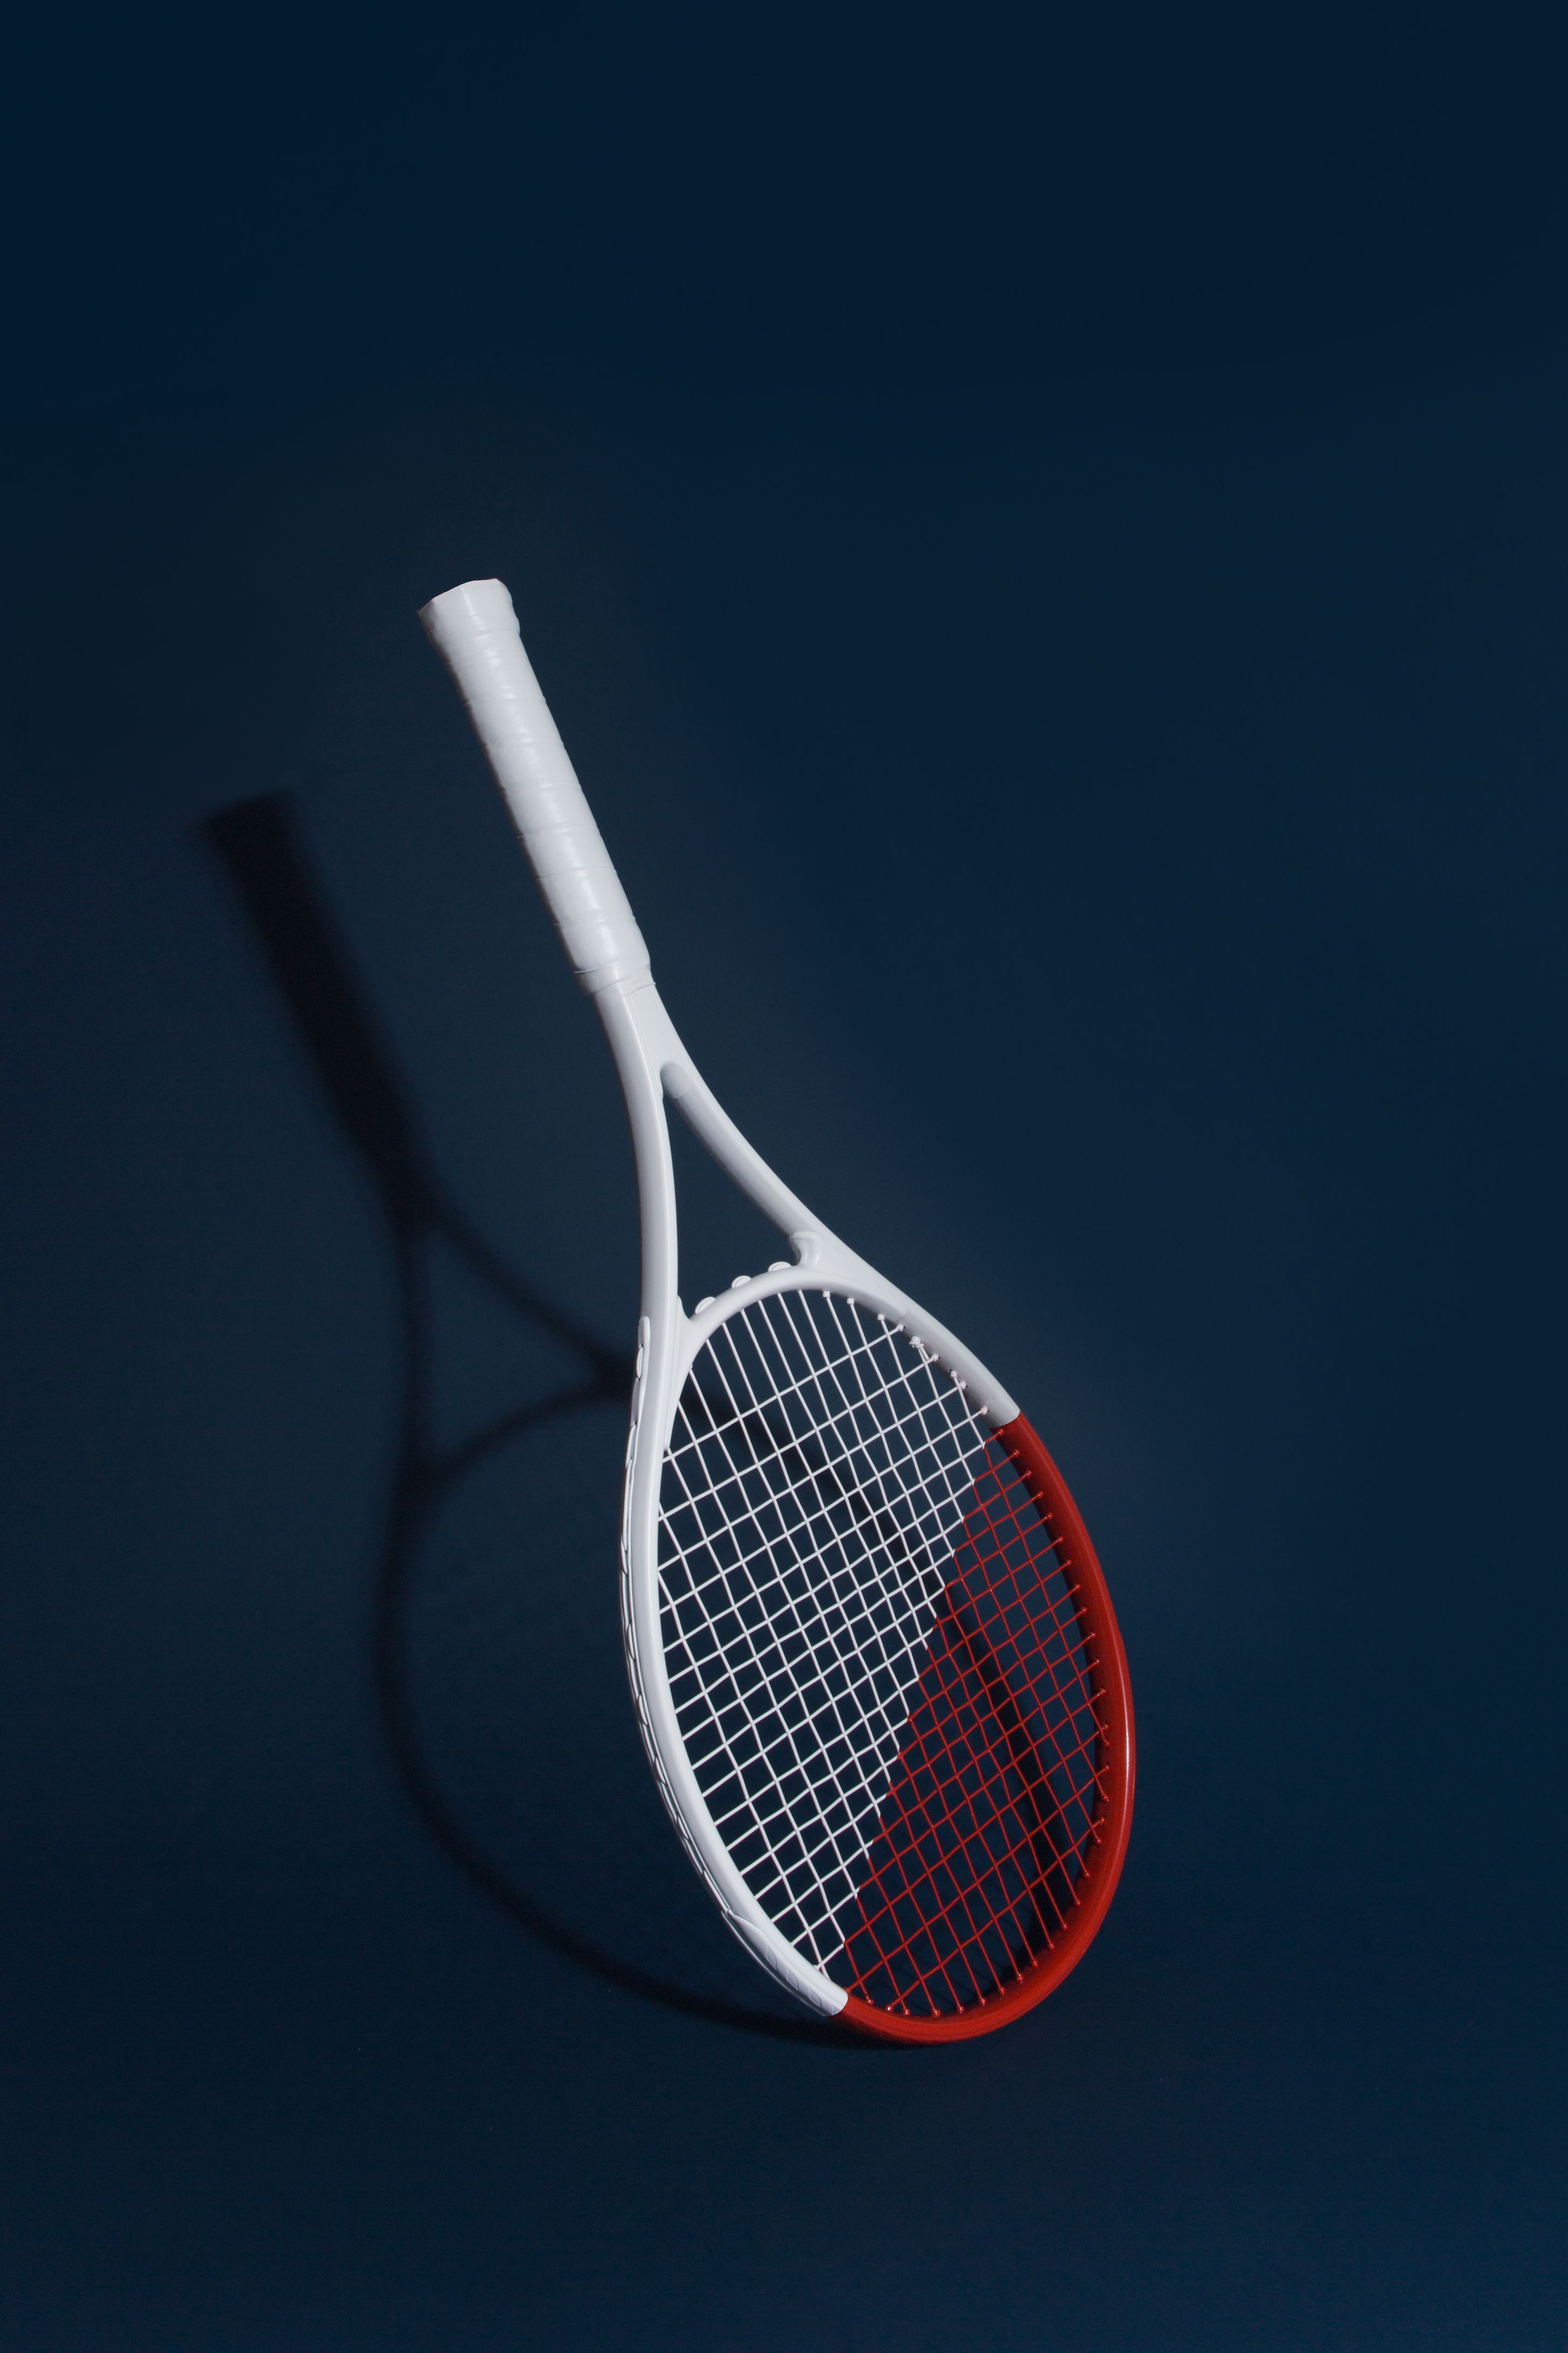 Tennis Court Lignes De Court Tennis Wallpaper Minimalist Inspiration Free Iphone Wallpaper